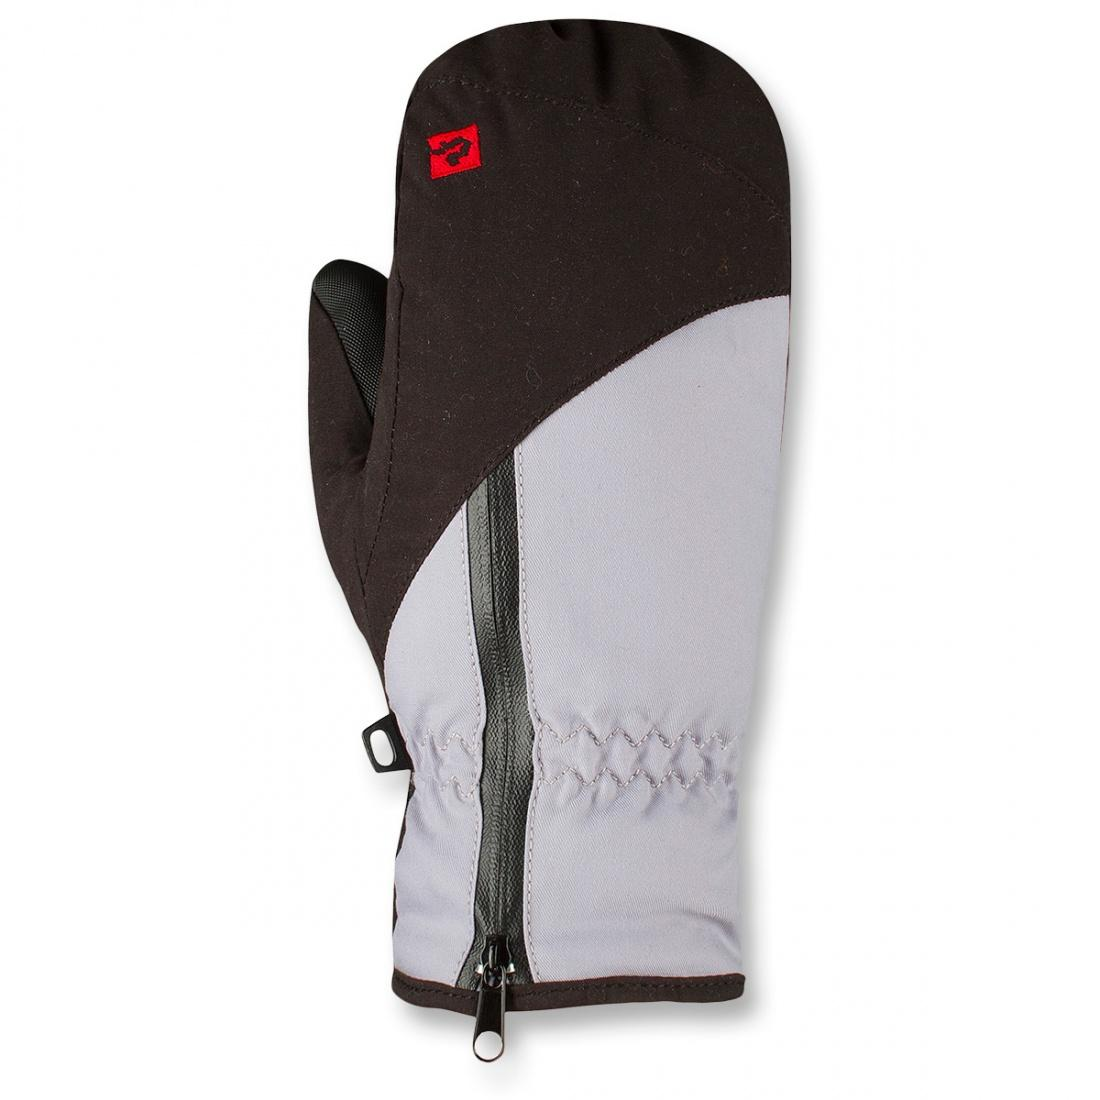 Рукавицы утепленные Traverse II ПодростковыеВарежки<br><br> Прогулочные утепленные рукавицы с ярким дизайном.<br><br><br><br><br><br>Материал – 50% Polyester, 50% Nylon, 156 g/sqm.<br>Усиление – 80% Polyvinyl Chloride, 20% Polyester, 690 g/sqm.<br>Утеплитель – Omnitherm® Classic...<br><br>Цвет: Синий<br>Размер: L